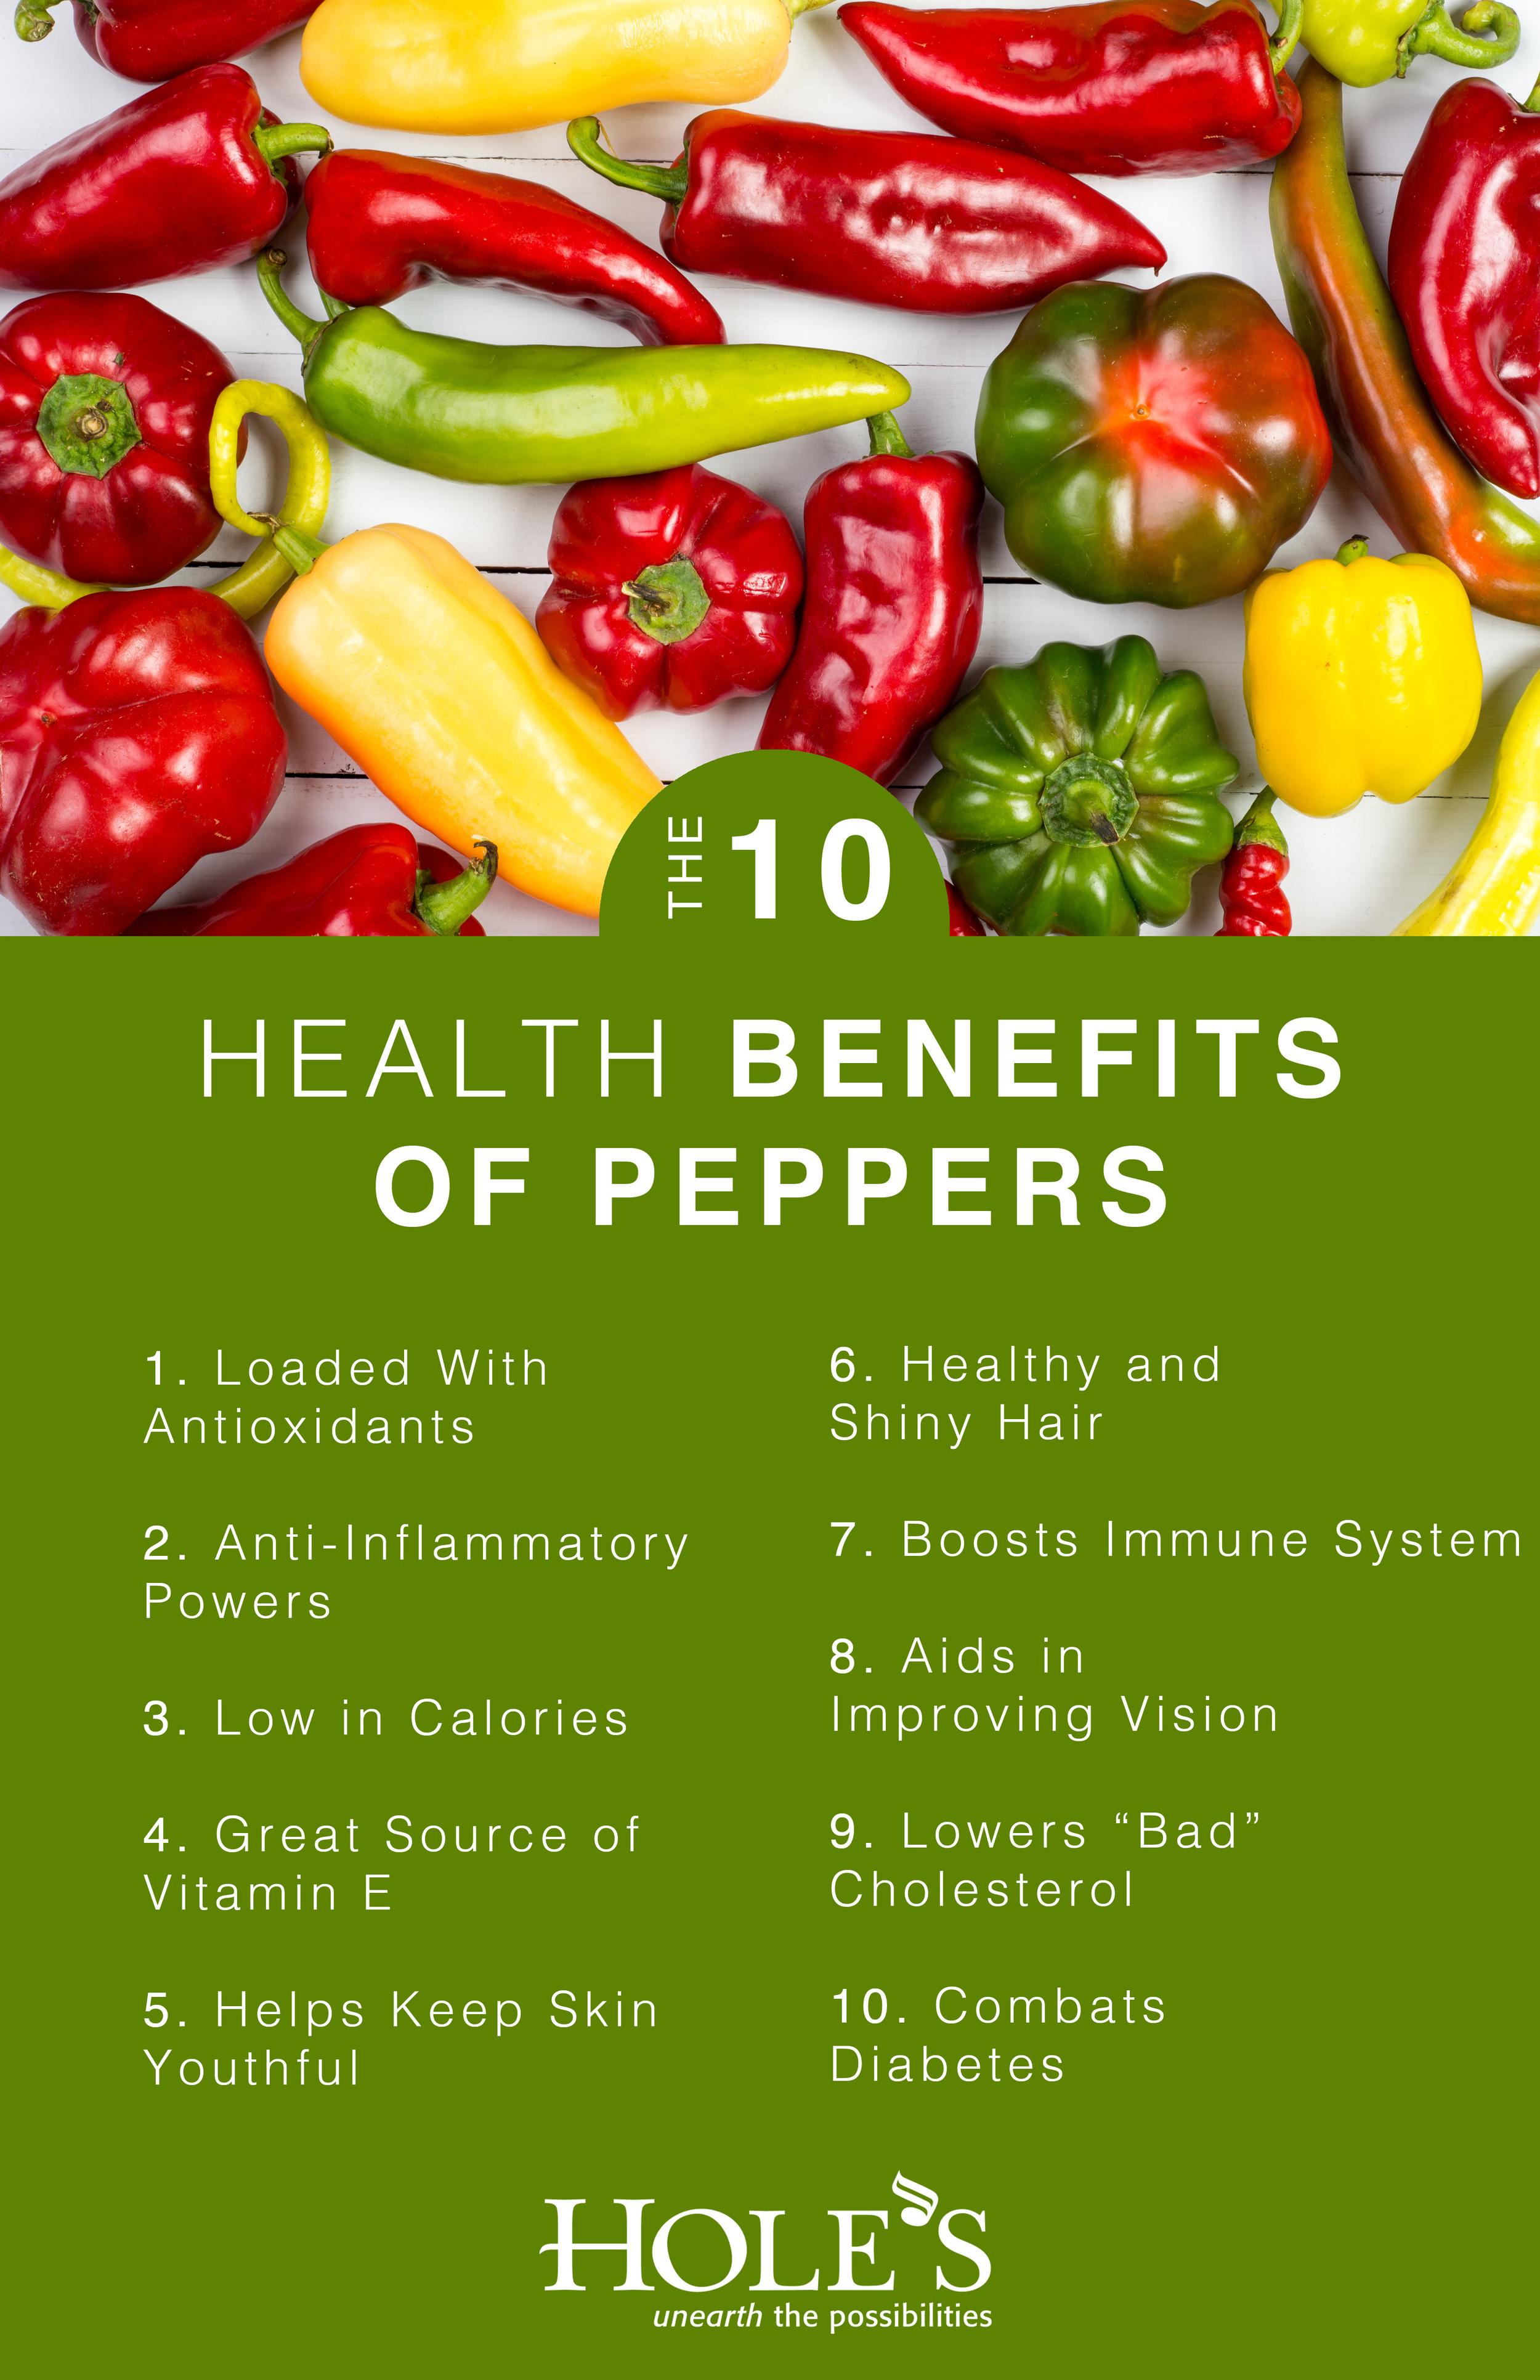 Health Benefits of Peppers2.jpg